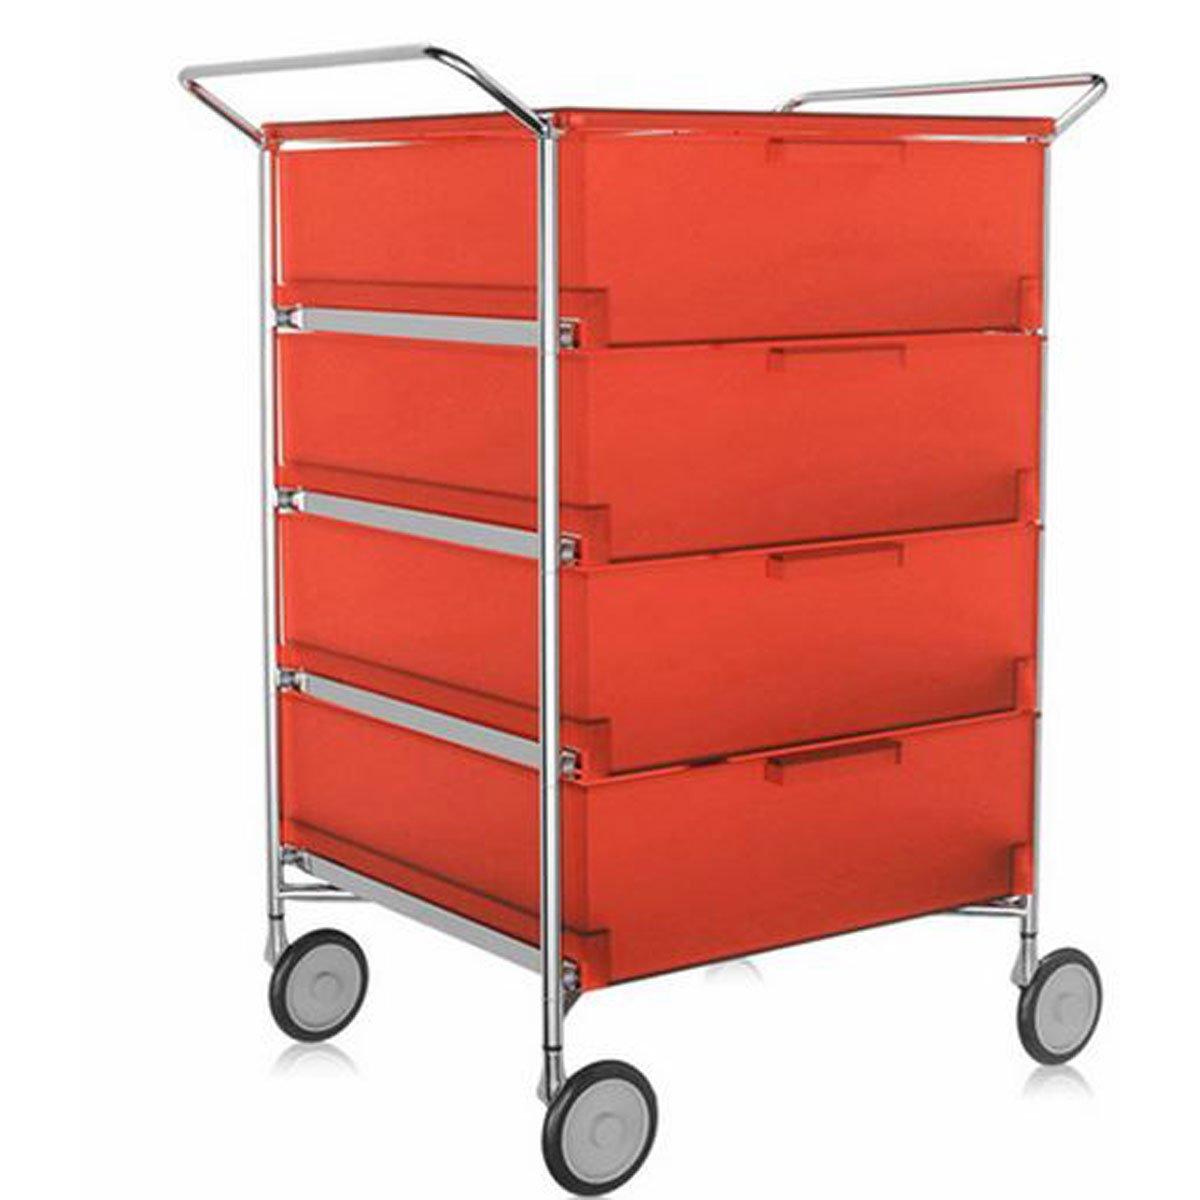 Kartell 2335L4 Container Mobil, 4 Schubladen, dunkelorange